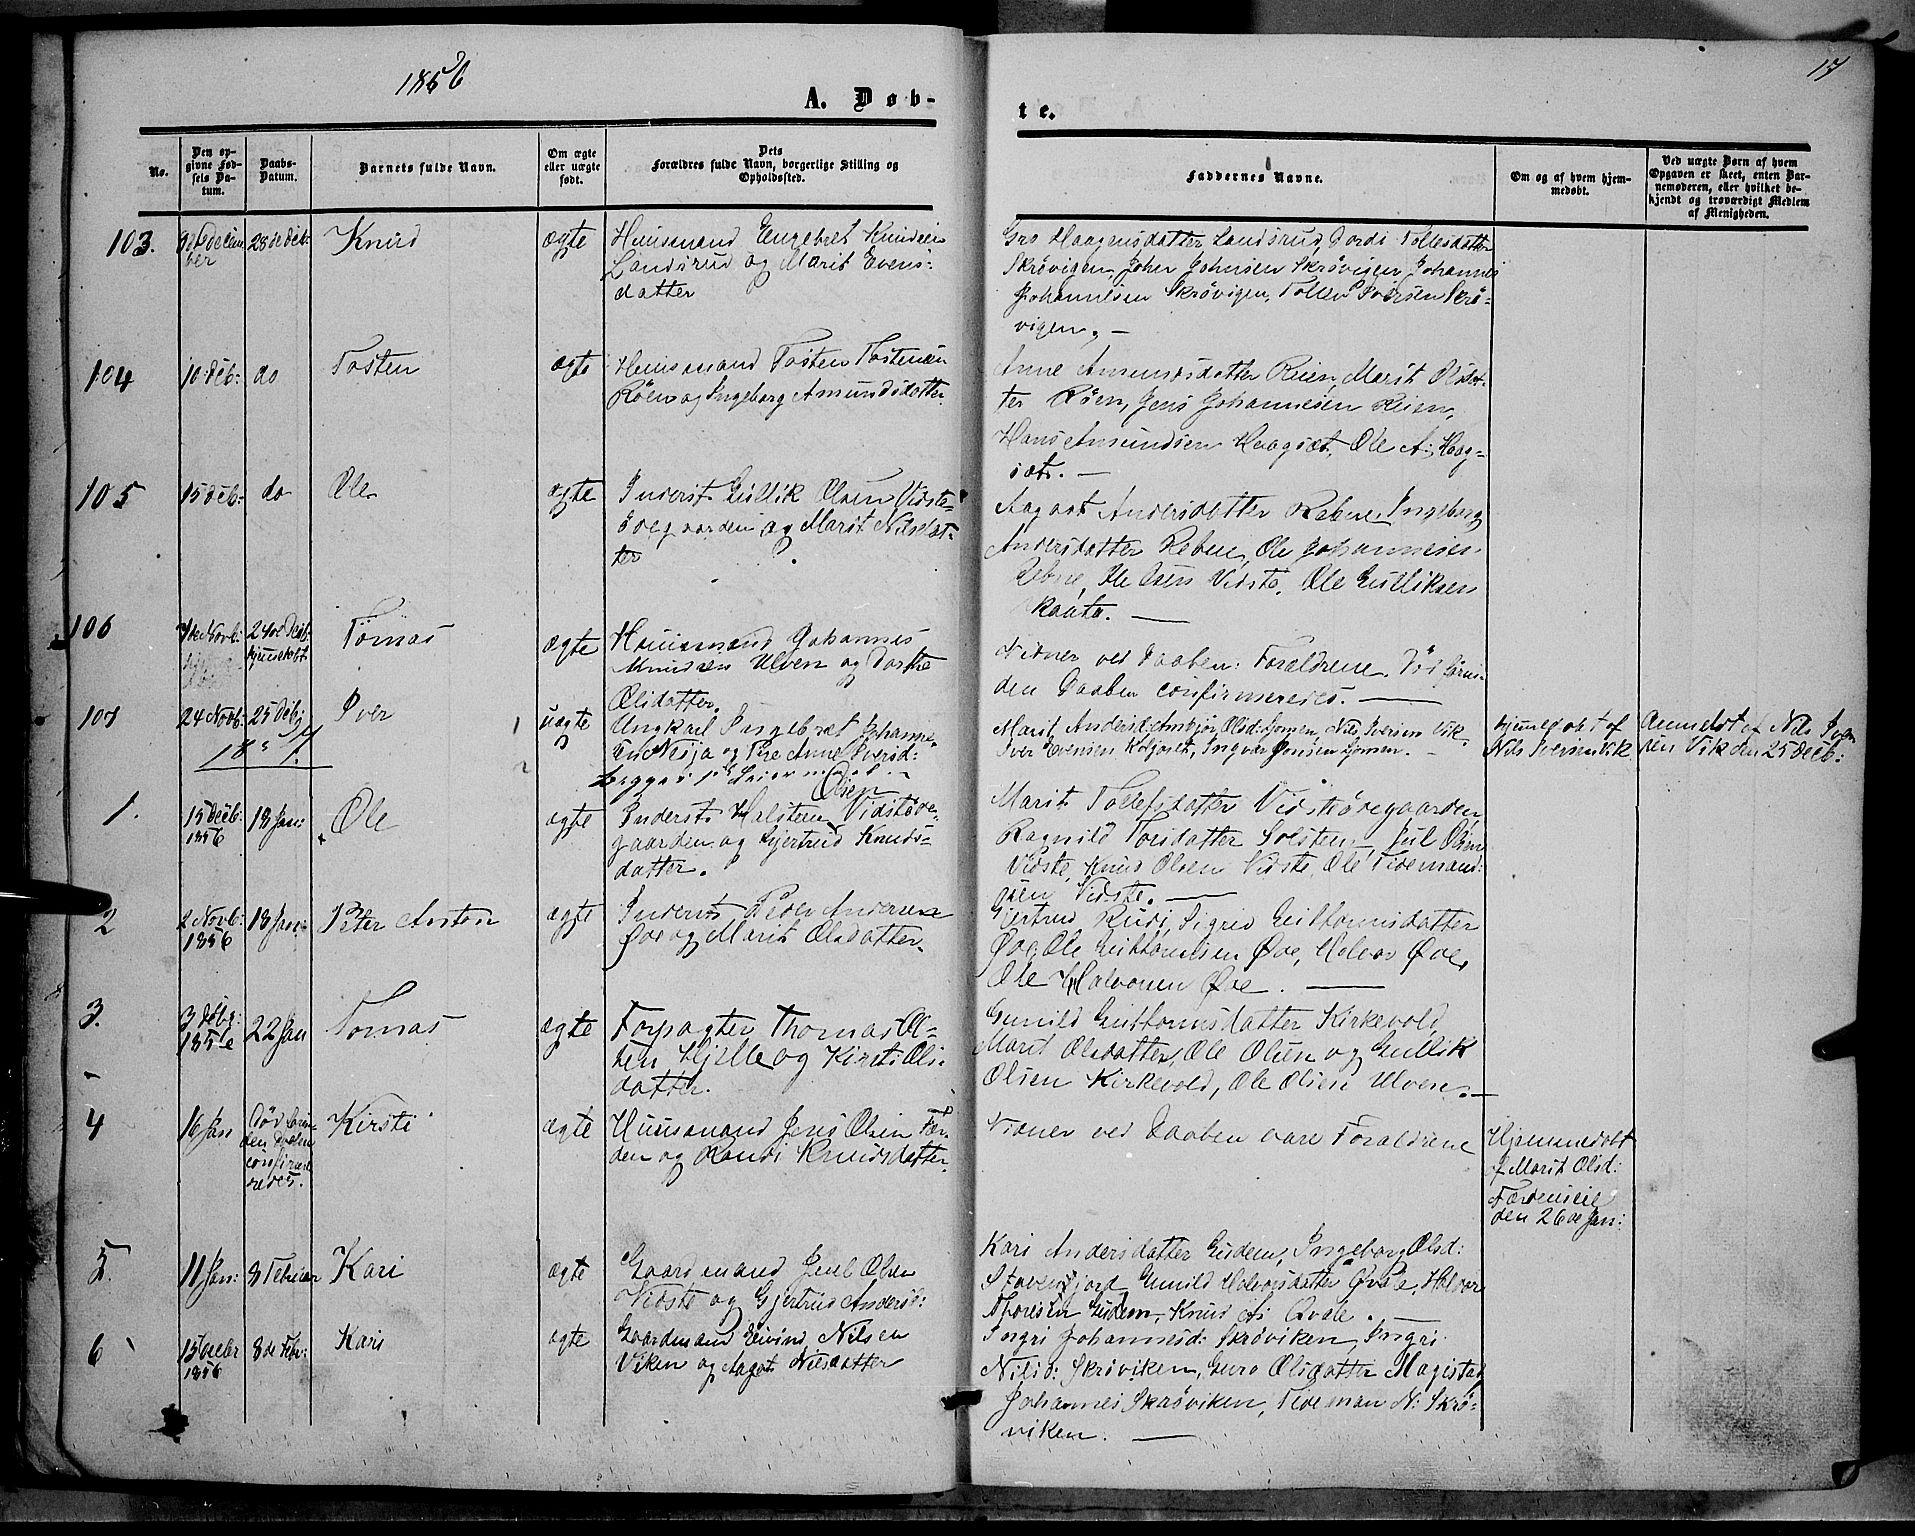 SAH, Vestre Slidre prestekontor, Ministerialbok nr. 2, 1856-1864, s. 17